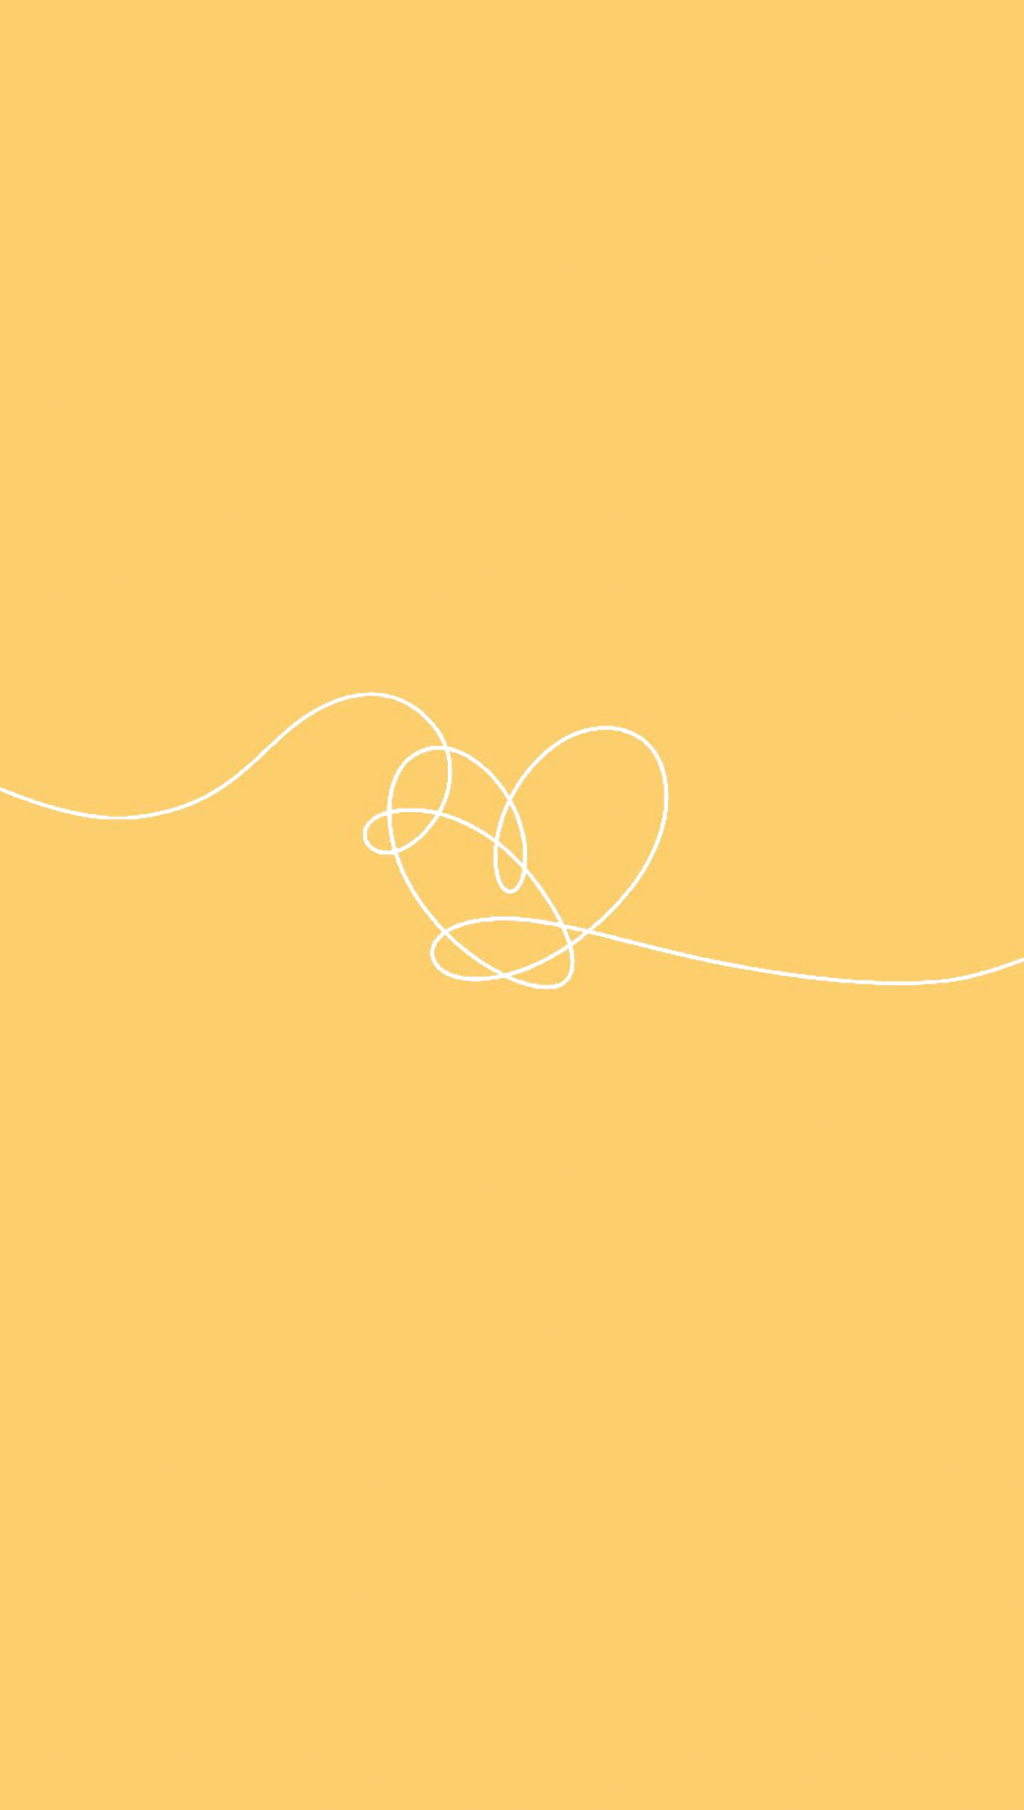 Pin On Aesthetics Iphone Wallpaper Yellow Yellow Aesthetic Pastel Yellow Aesthetic